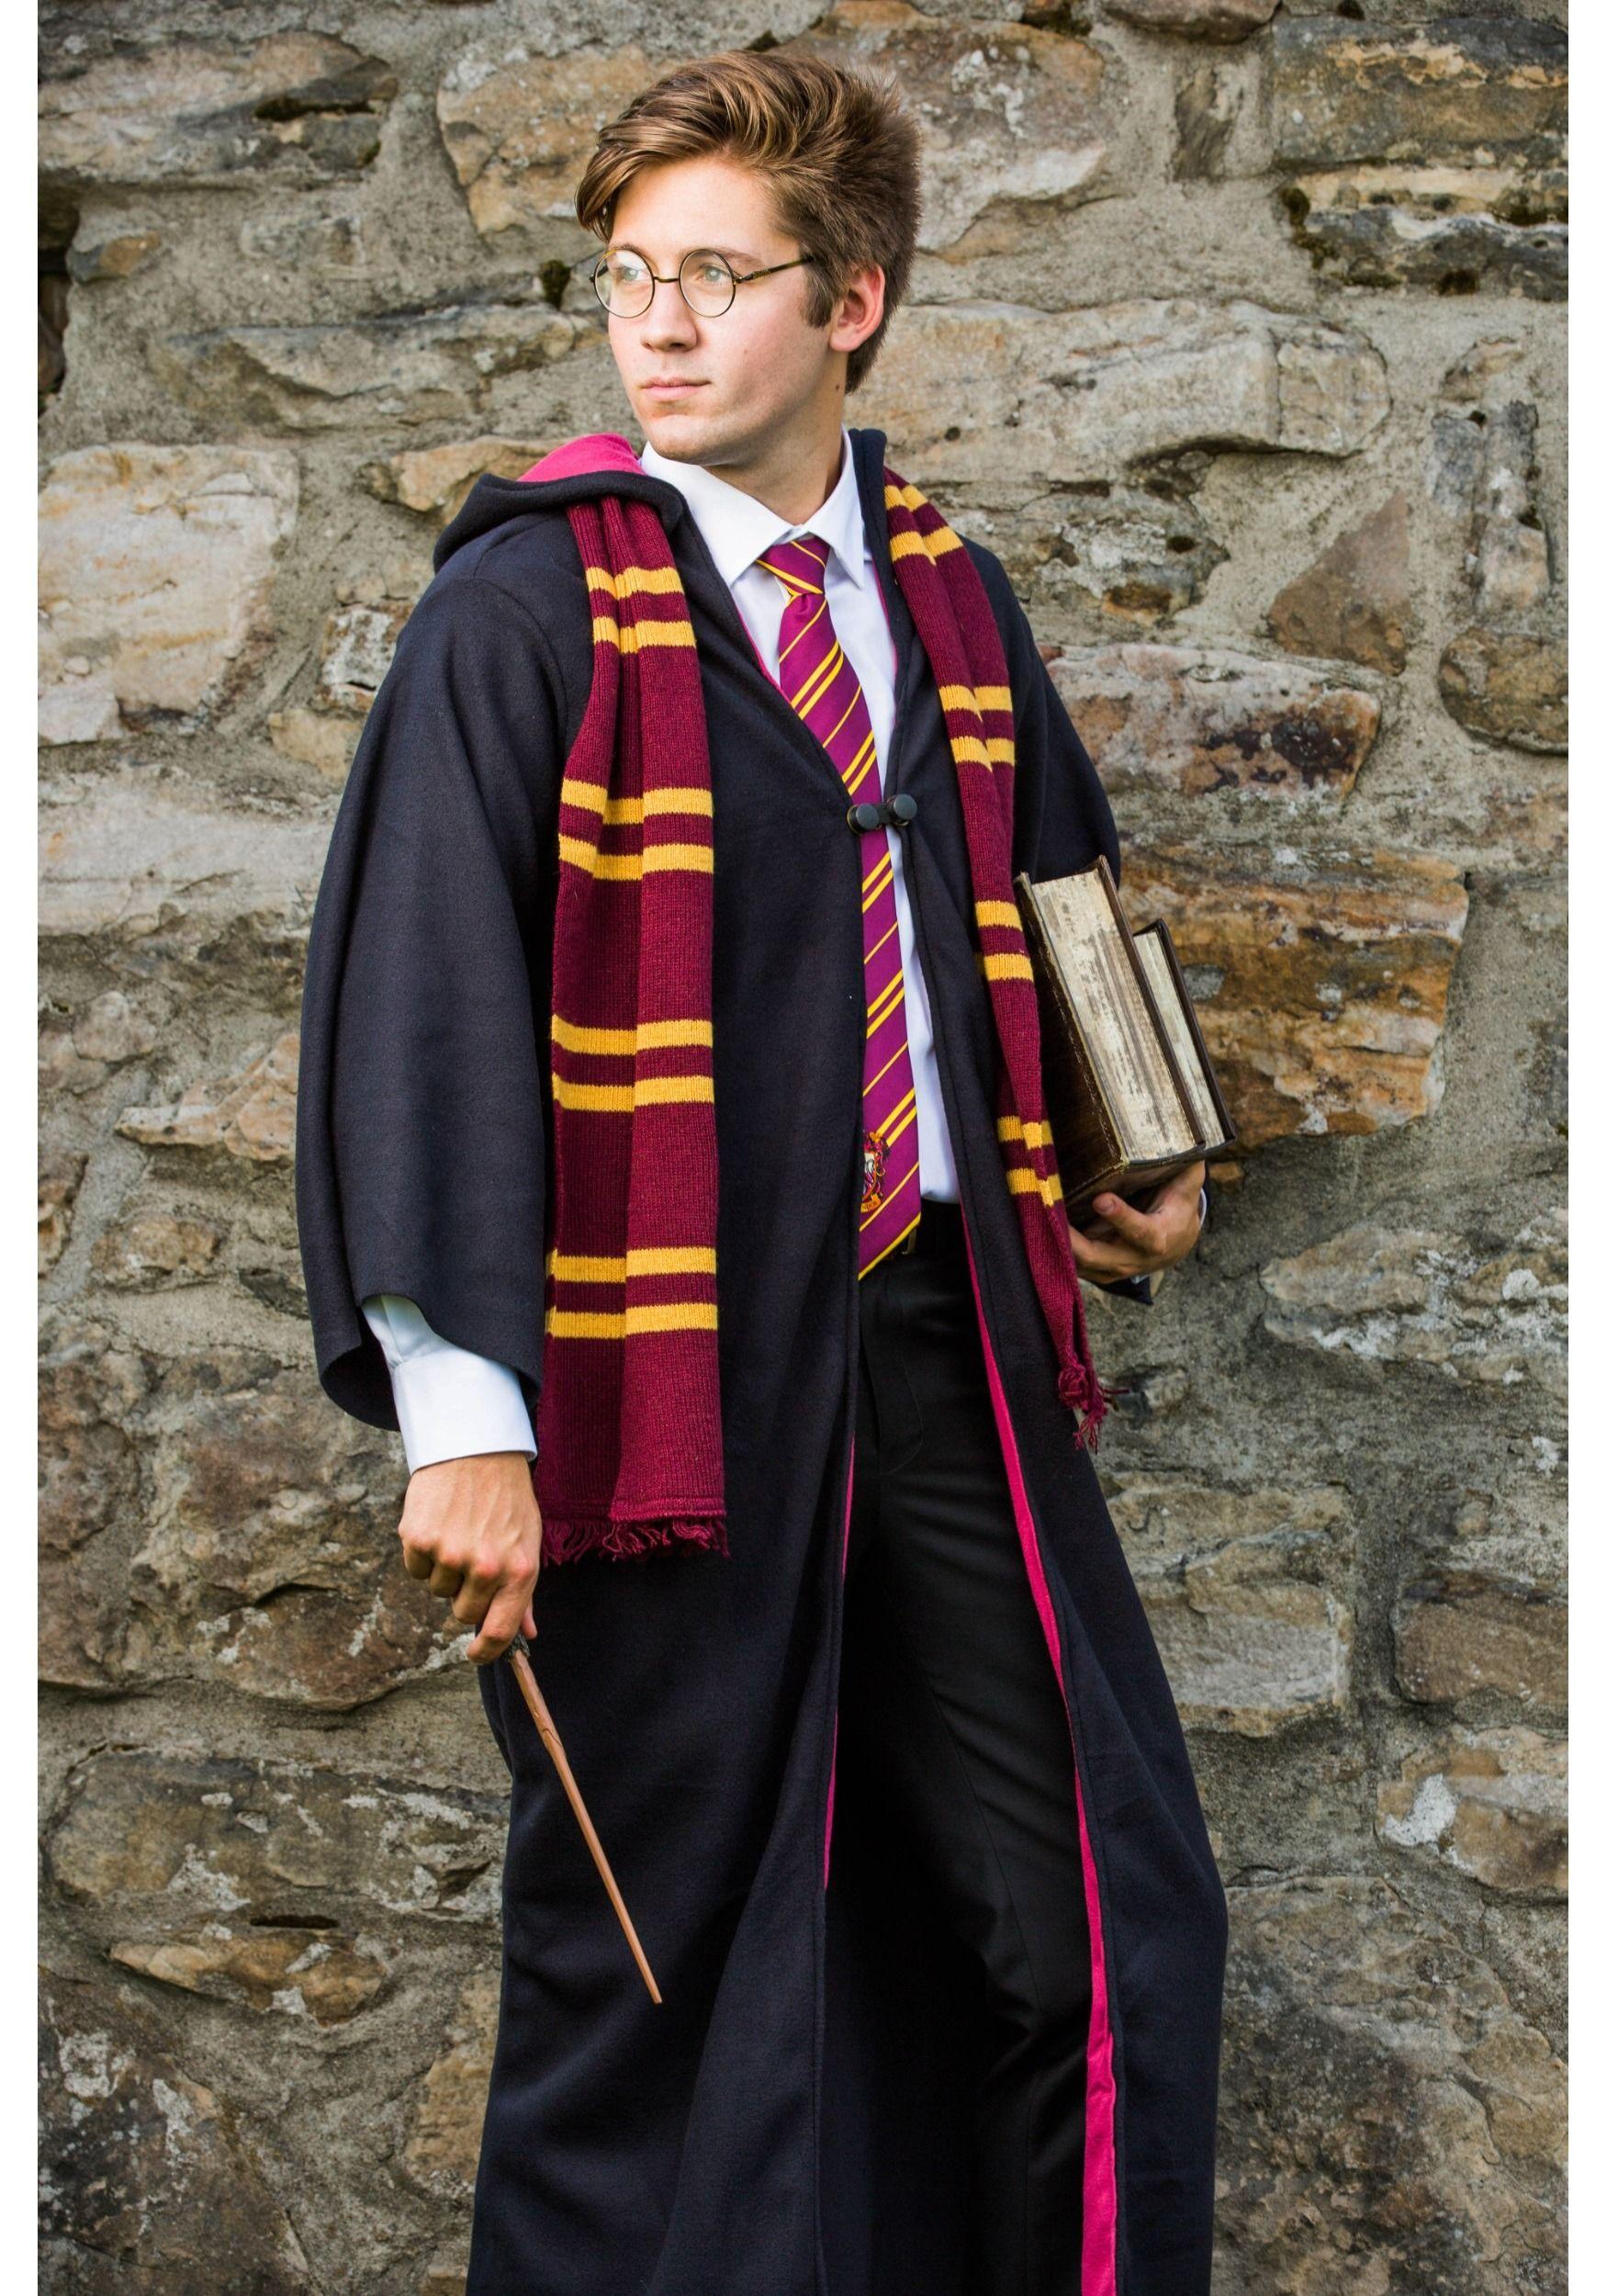 Good Harry Potter Uniform   Adult Deluxe Harry Potter Costume